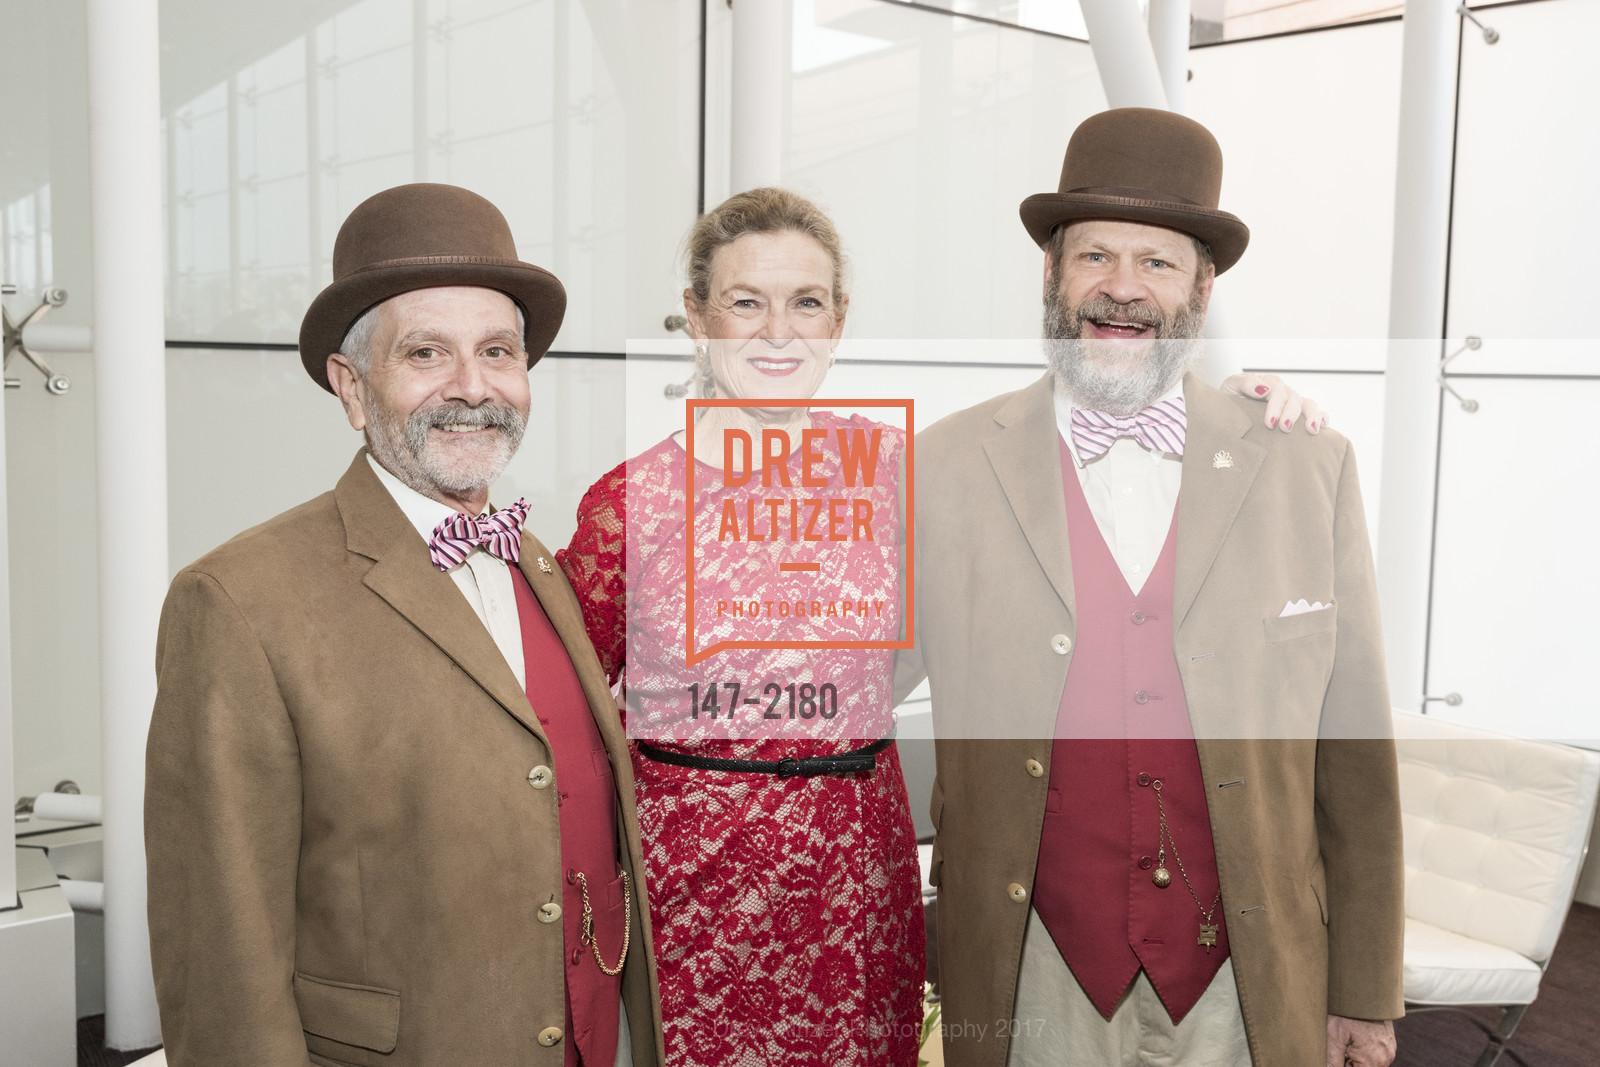 David Laudon, Heidi Munzinger, Randy Laroche, Photo #147-2180